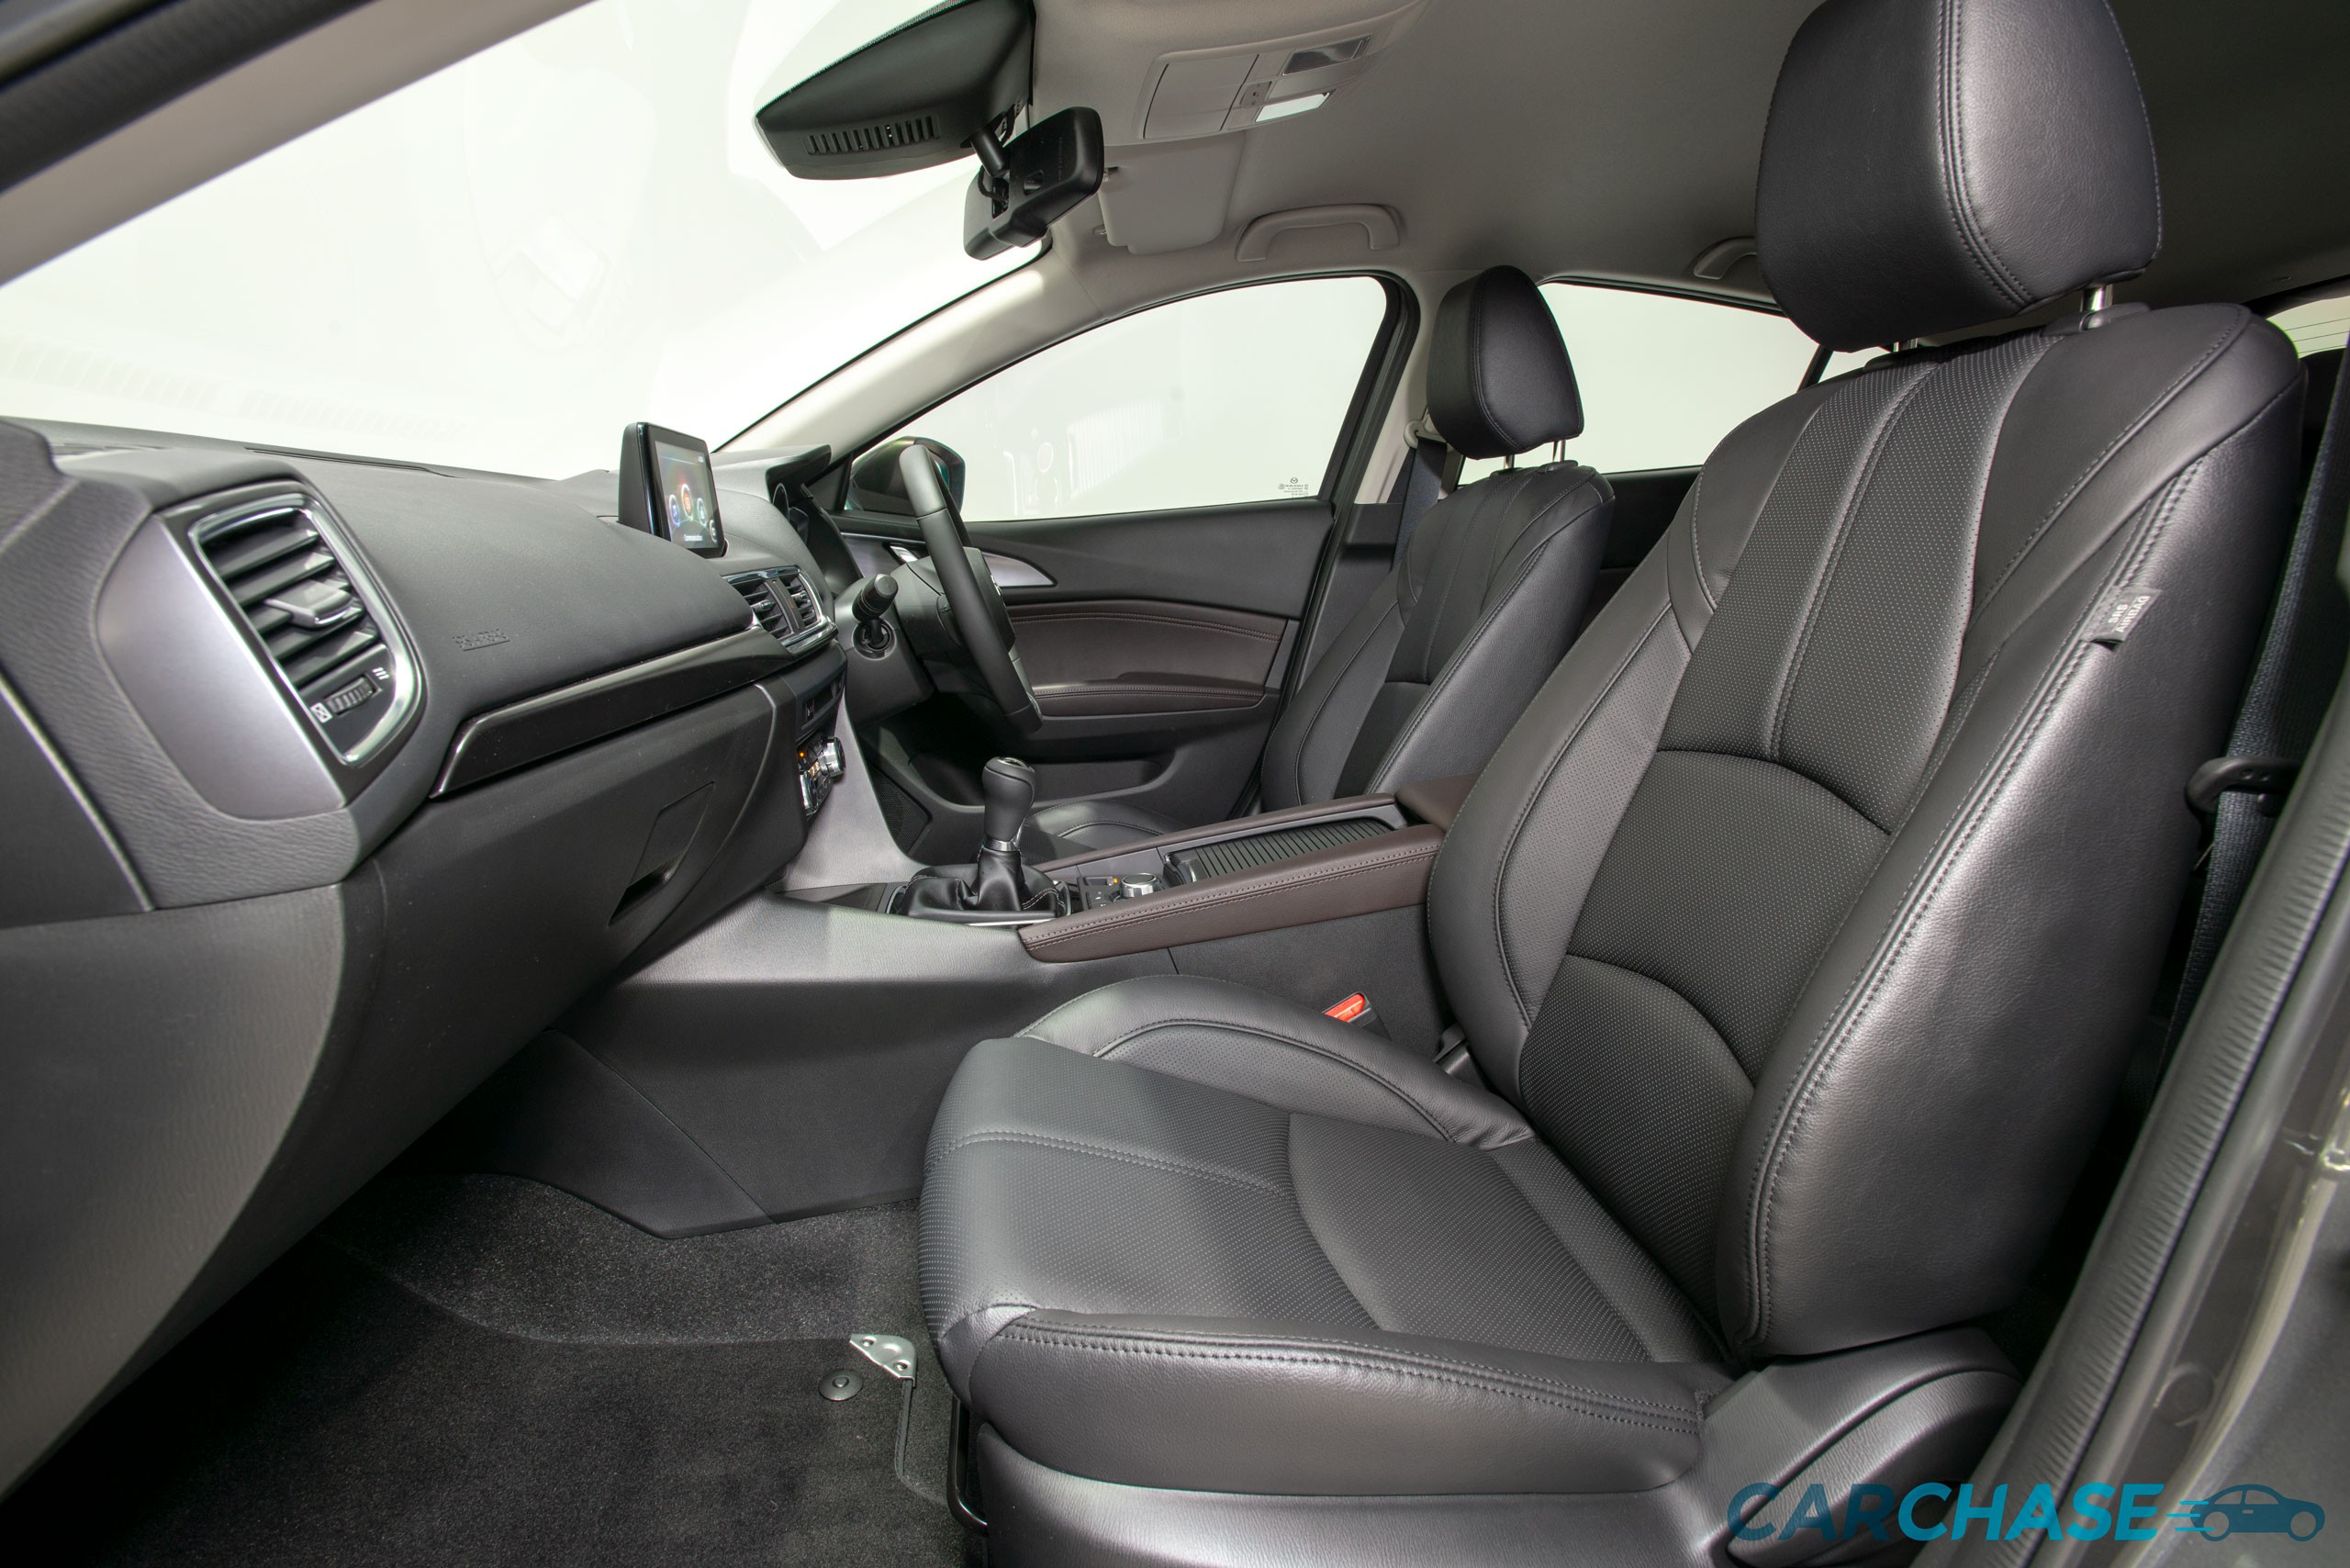 Image of passenger front profile of 2018 Mazda 3 SP25 GT